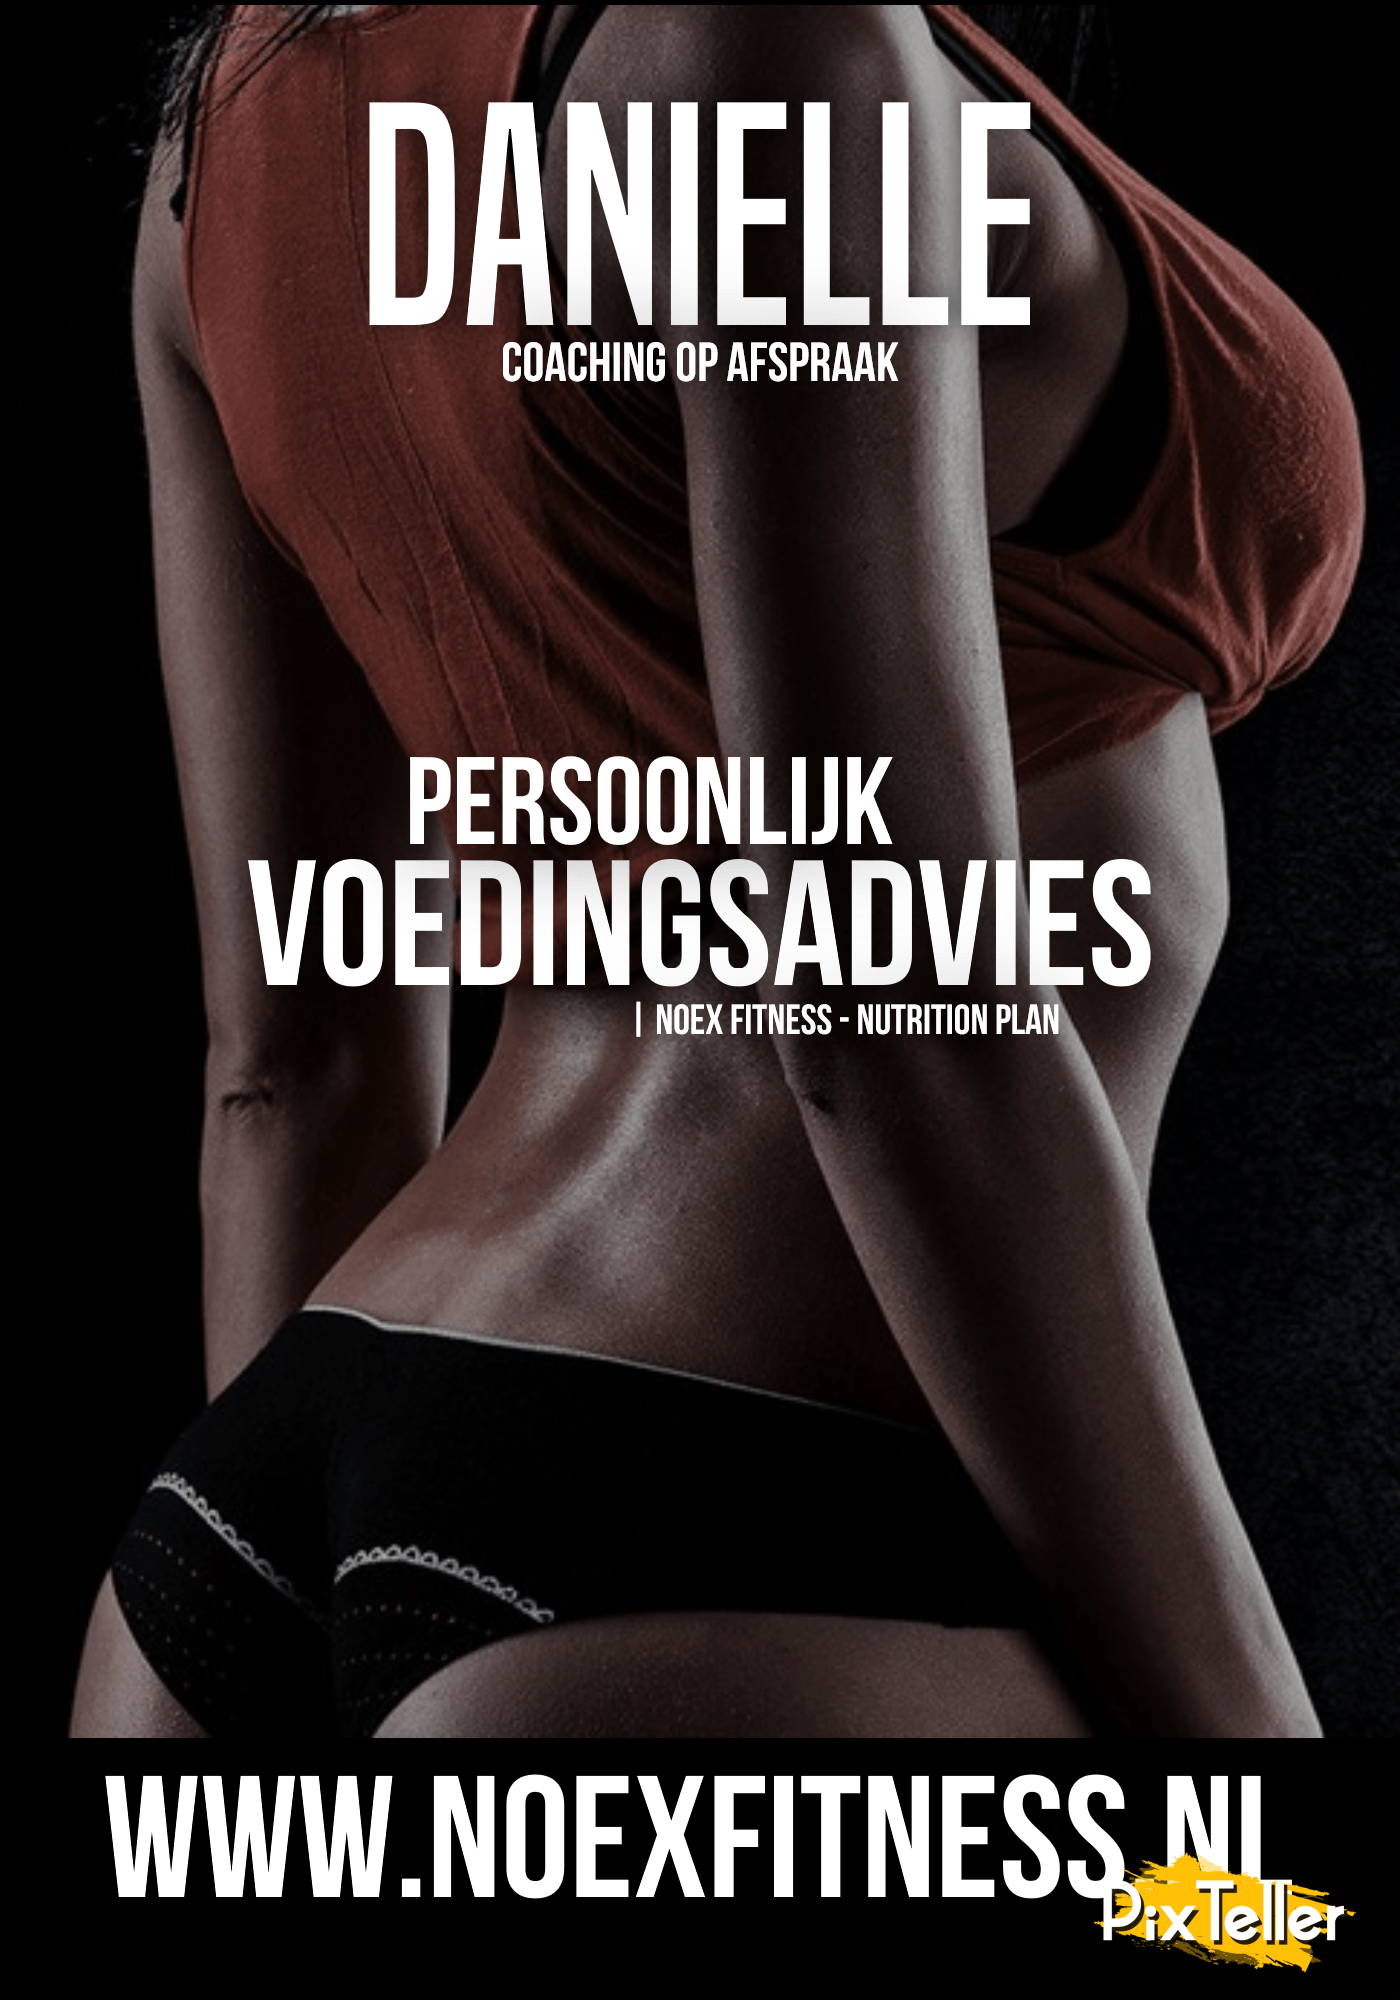 Joint,                Muscle,                Shoulder,                Abdomen,                Font,                Arm,                Hip,                Erotic,                Literature,                Trunk,                Active,                Undergarment,                White,                 Free Image